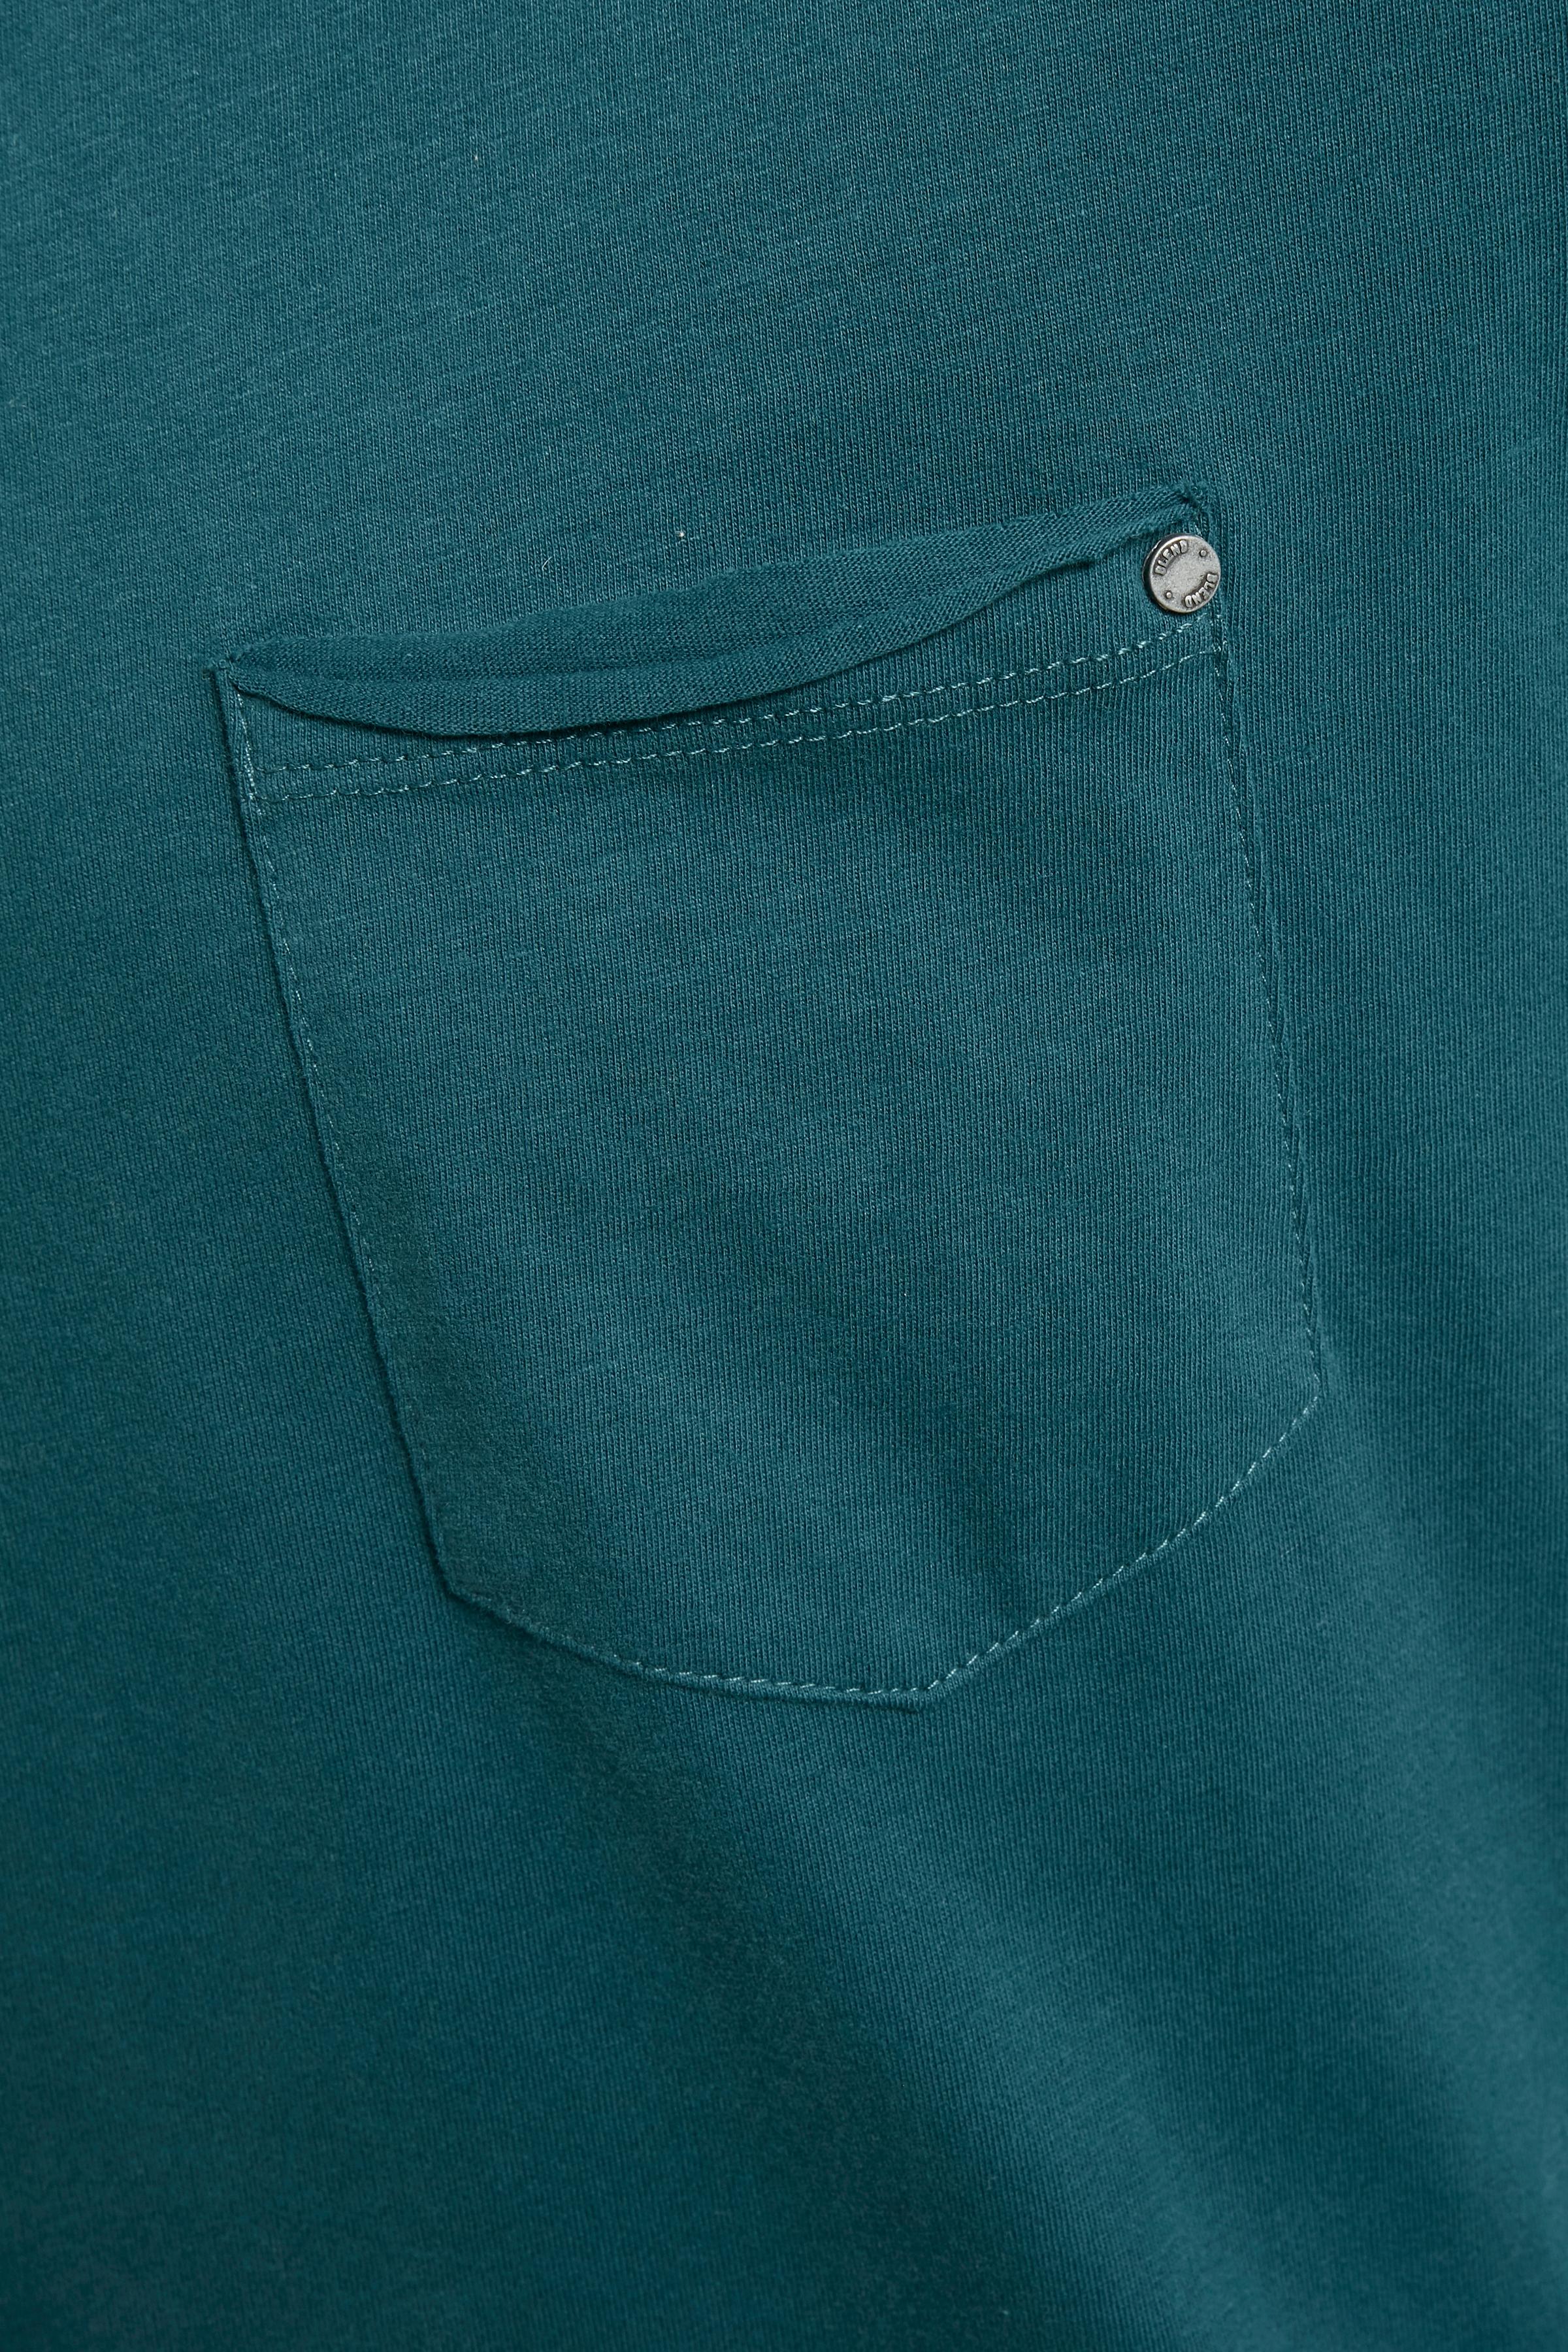 Mørkeblå Kortærmet T-shirt fra Blend He – Køb Mørkeblå Kortærmet T-shirt fra str. S-3XL her